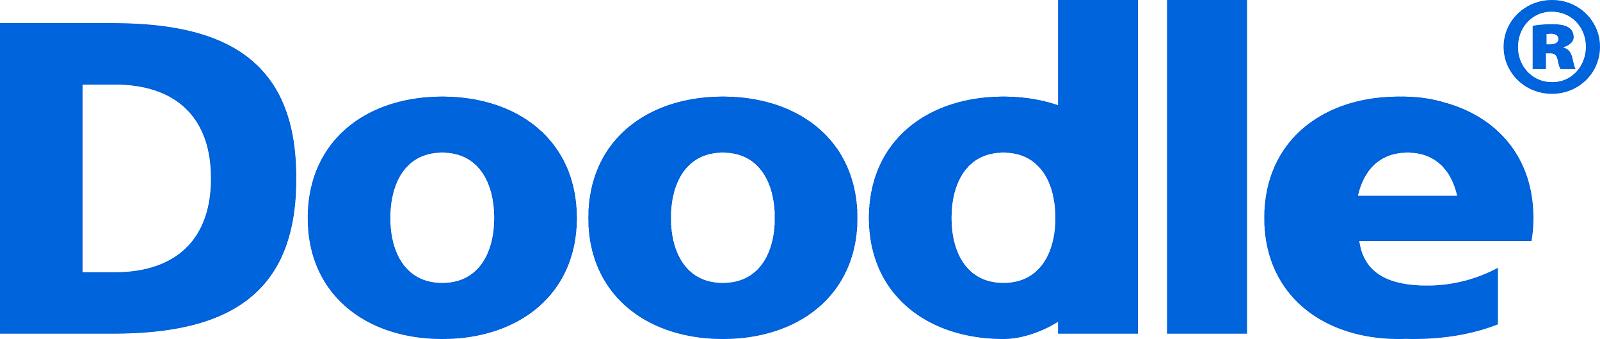 DoodleLogo1600